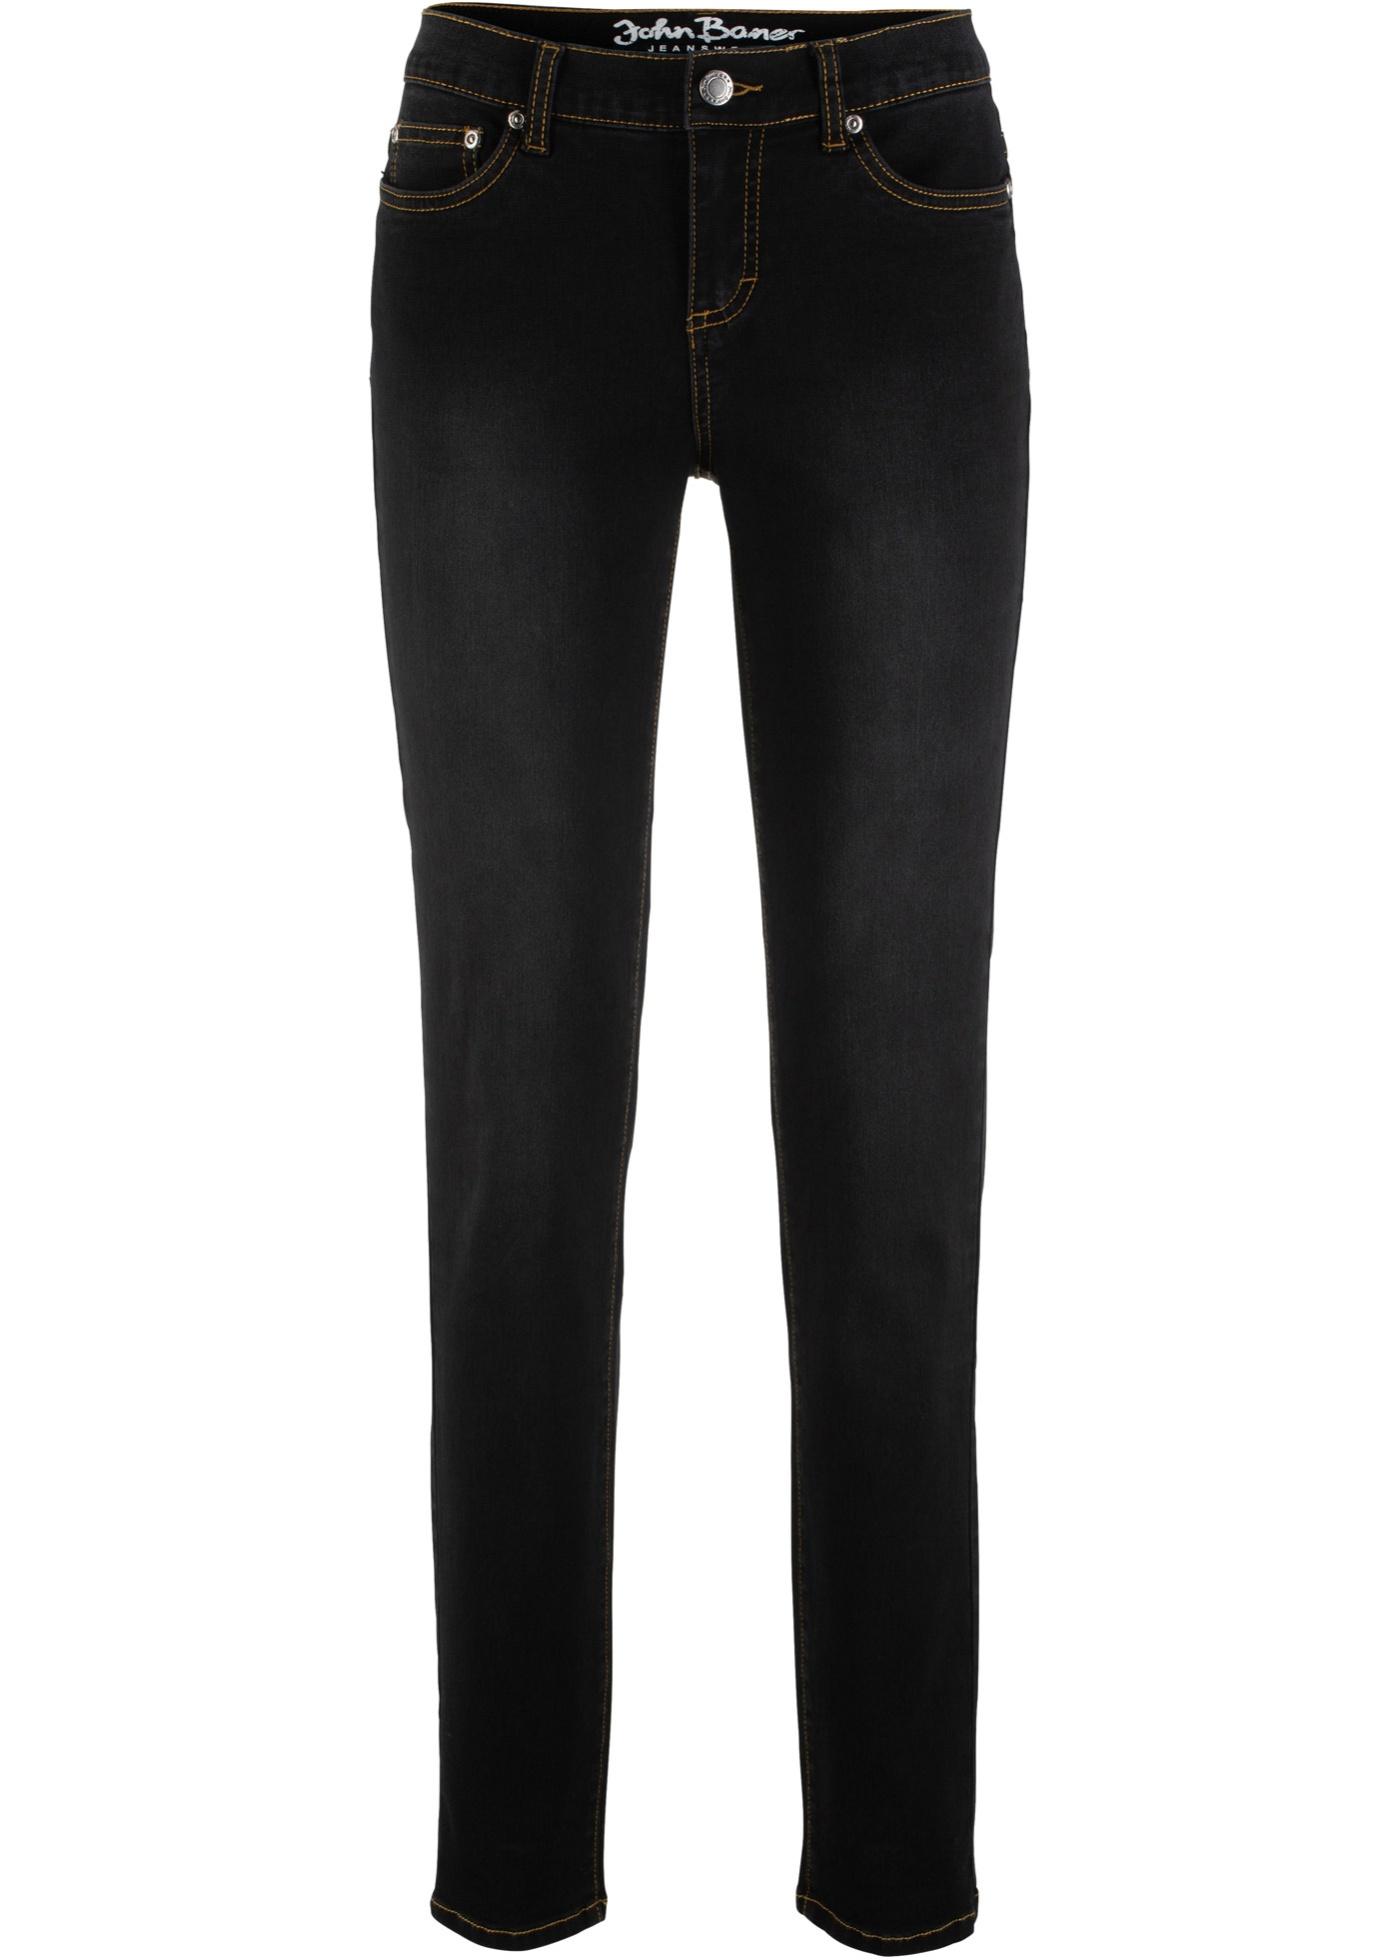 BonprixJean Slim Power Femme Baner Stretch Noir Pour John Jeanswear Y76vgIfyb